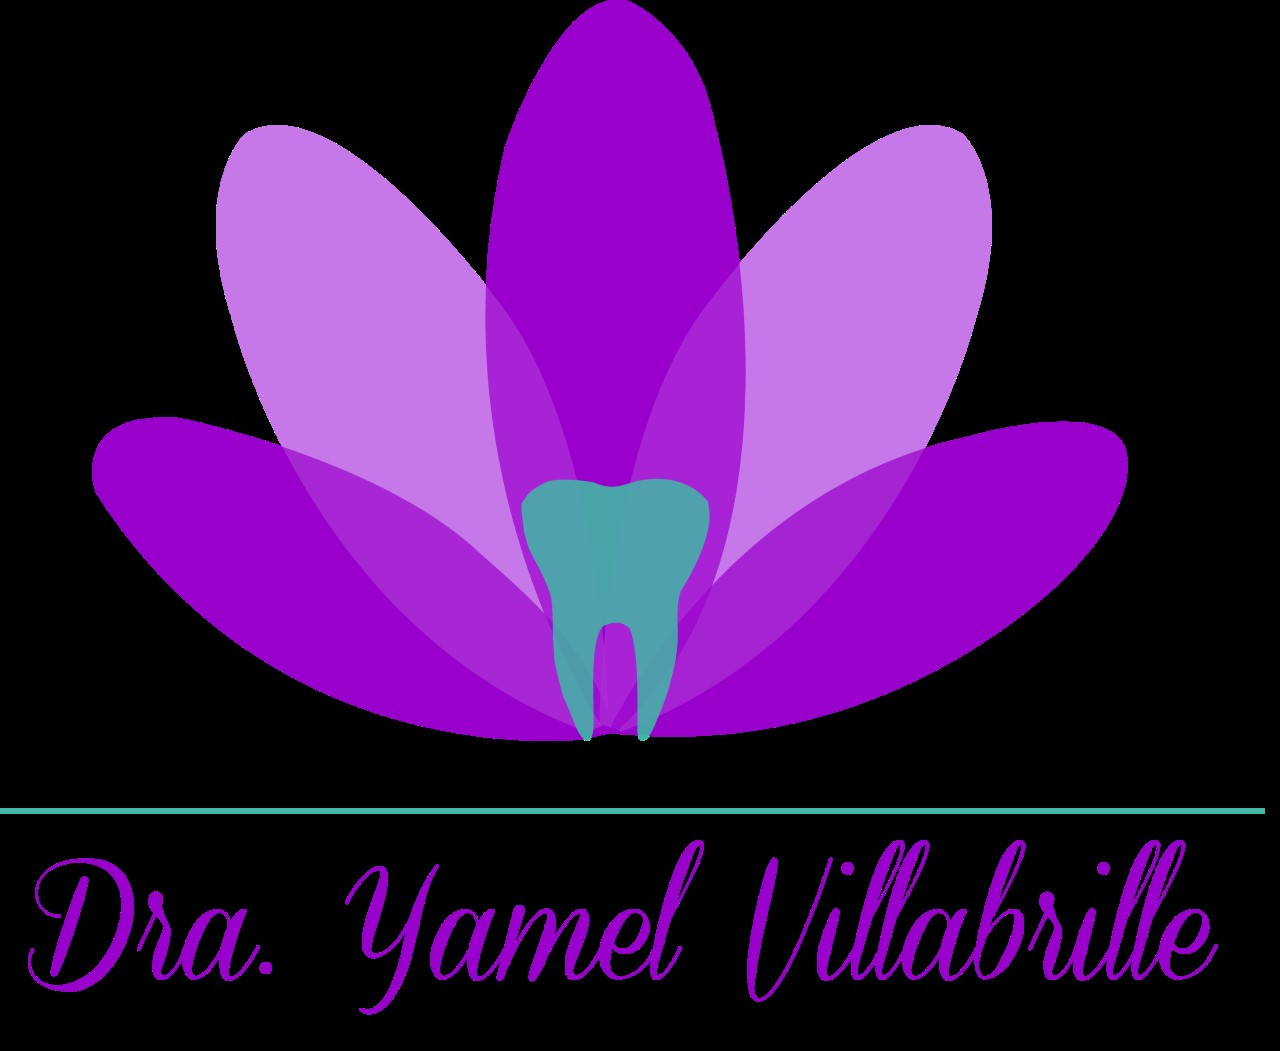 Dra. Yamel  Villabrille